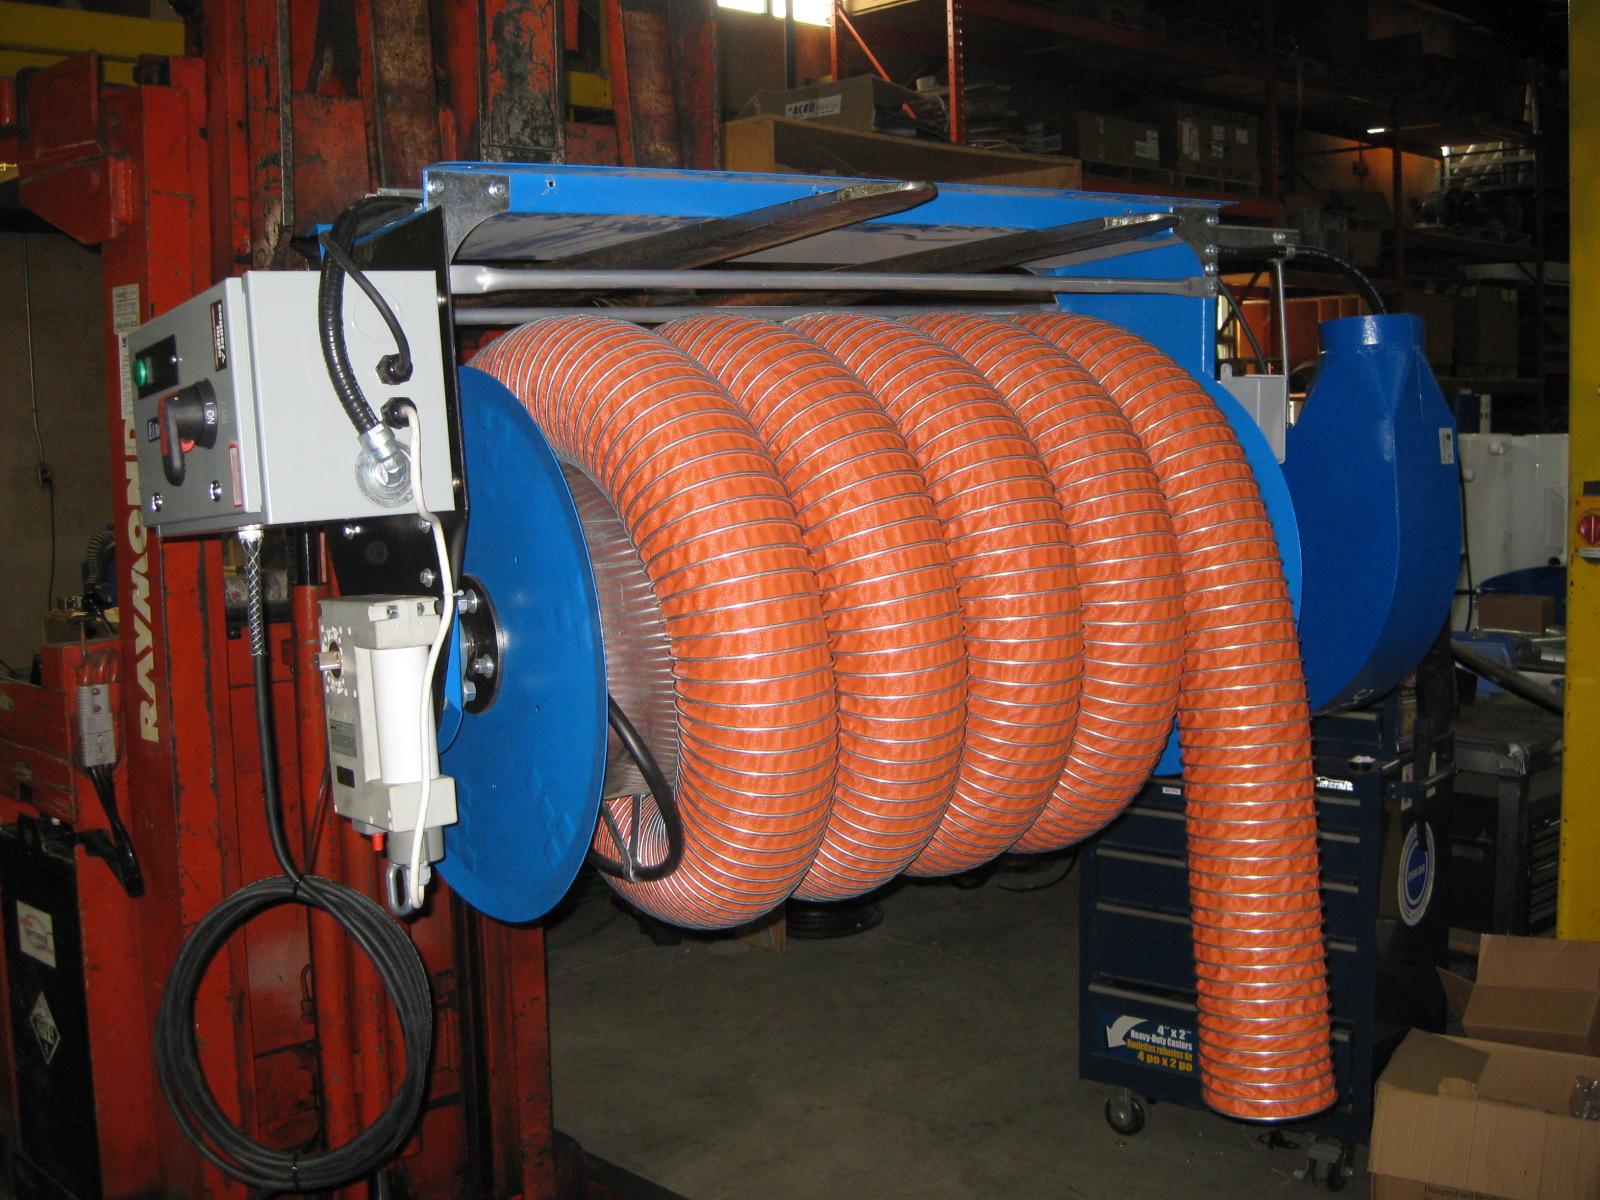 Vehicle Exhaust Motorized Hose Reels